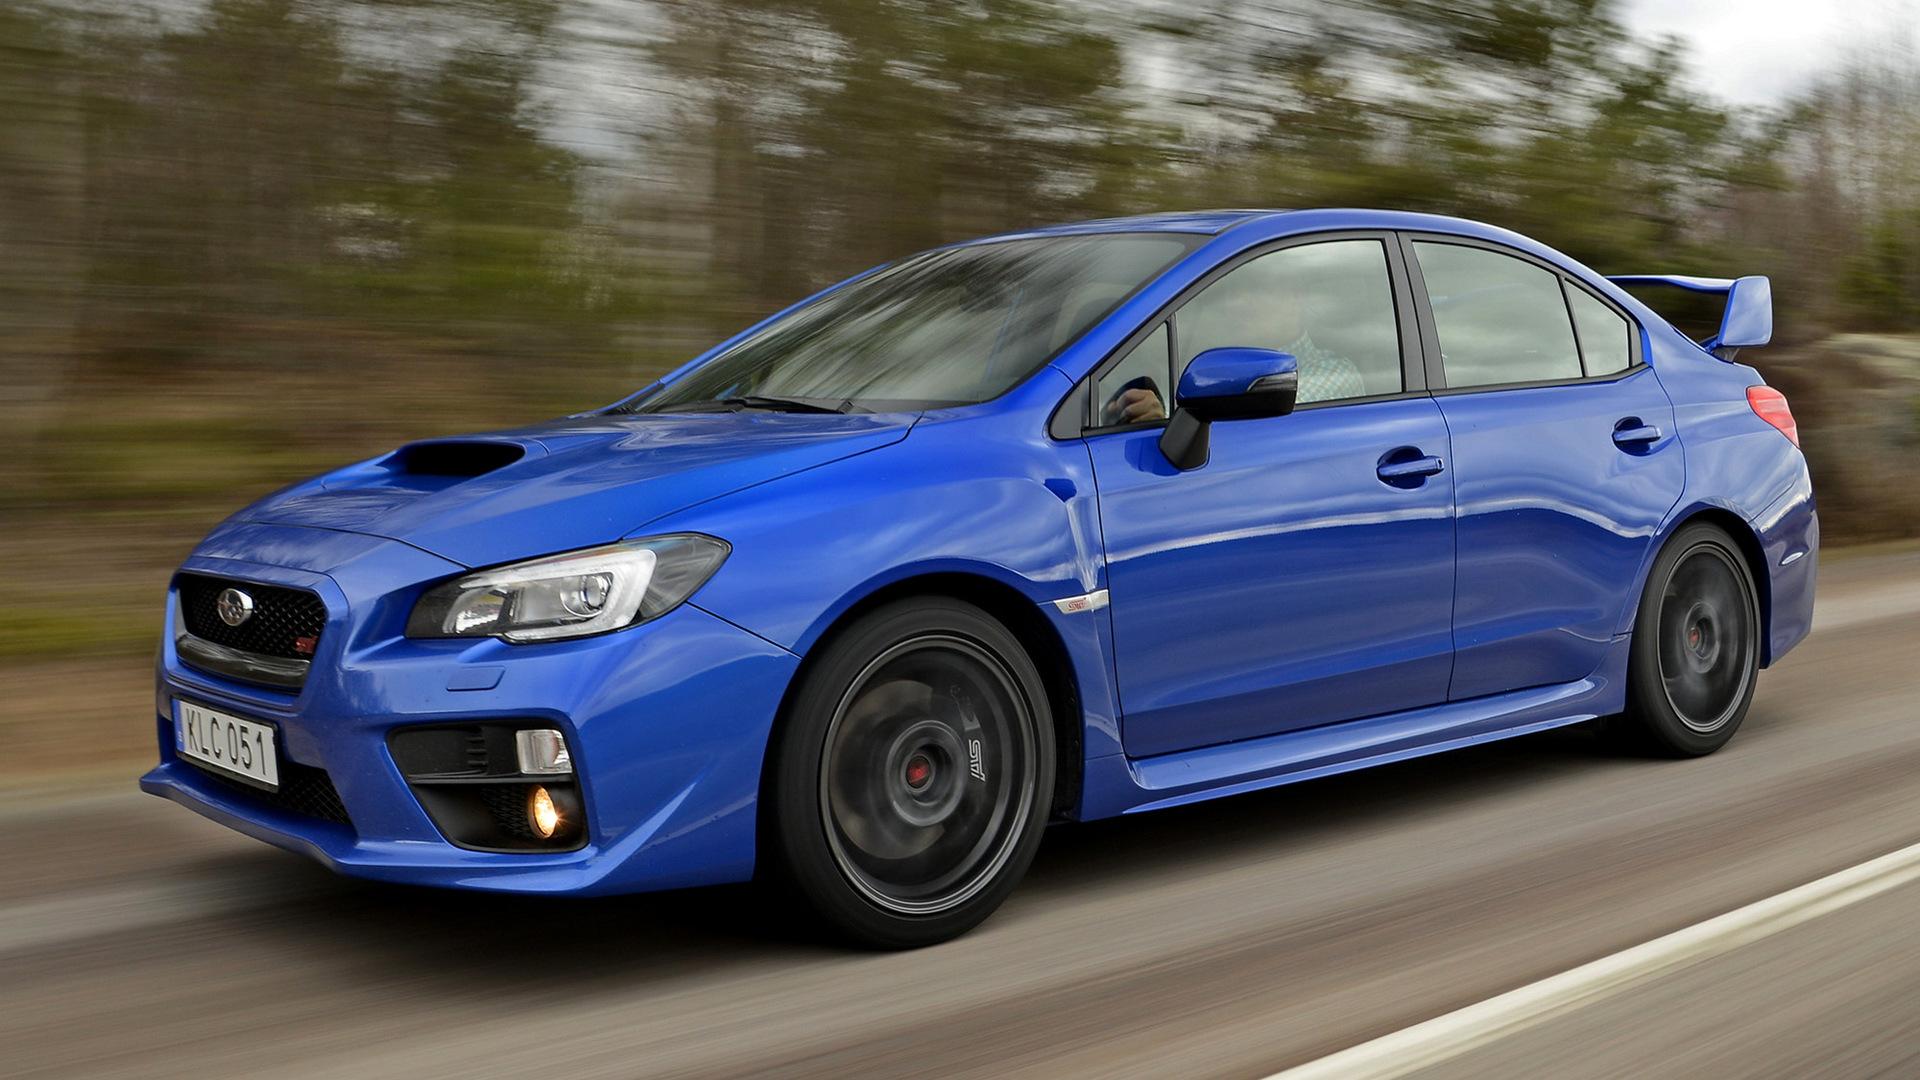 Subaru Wrx Sti 2014 Wallpapers And Hd Images Car Pixel